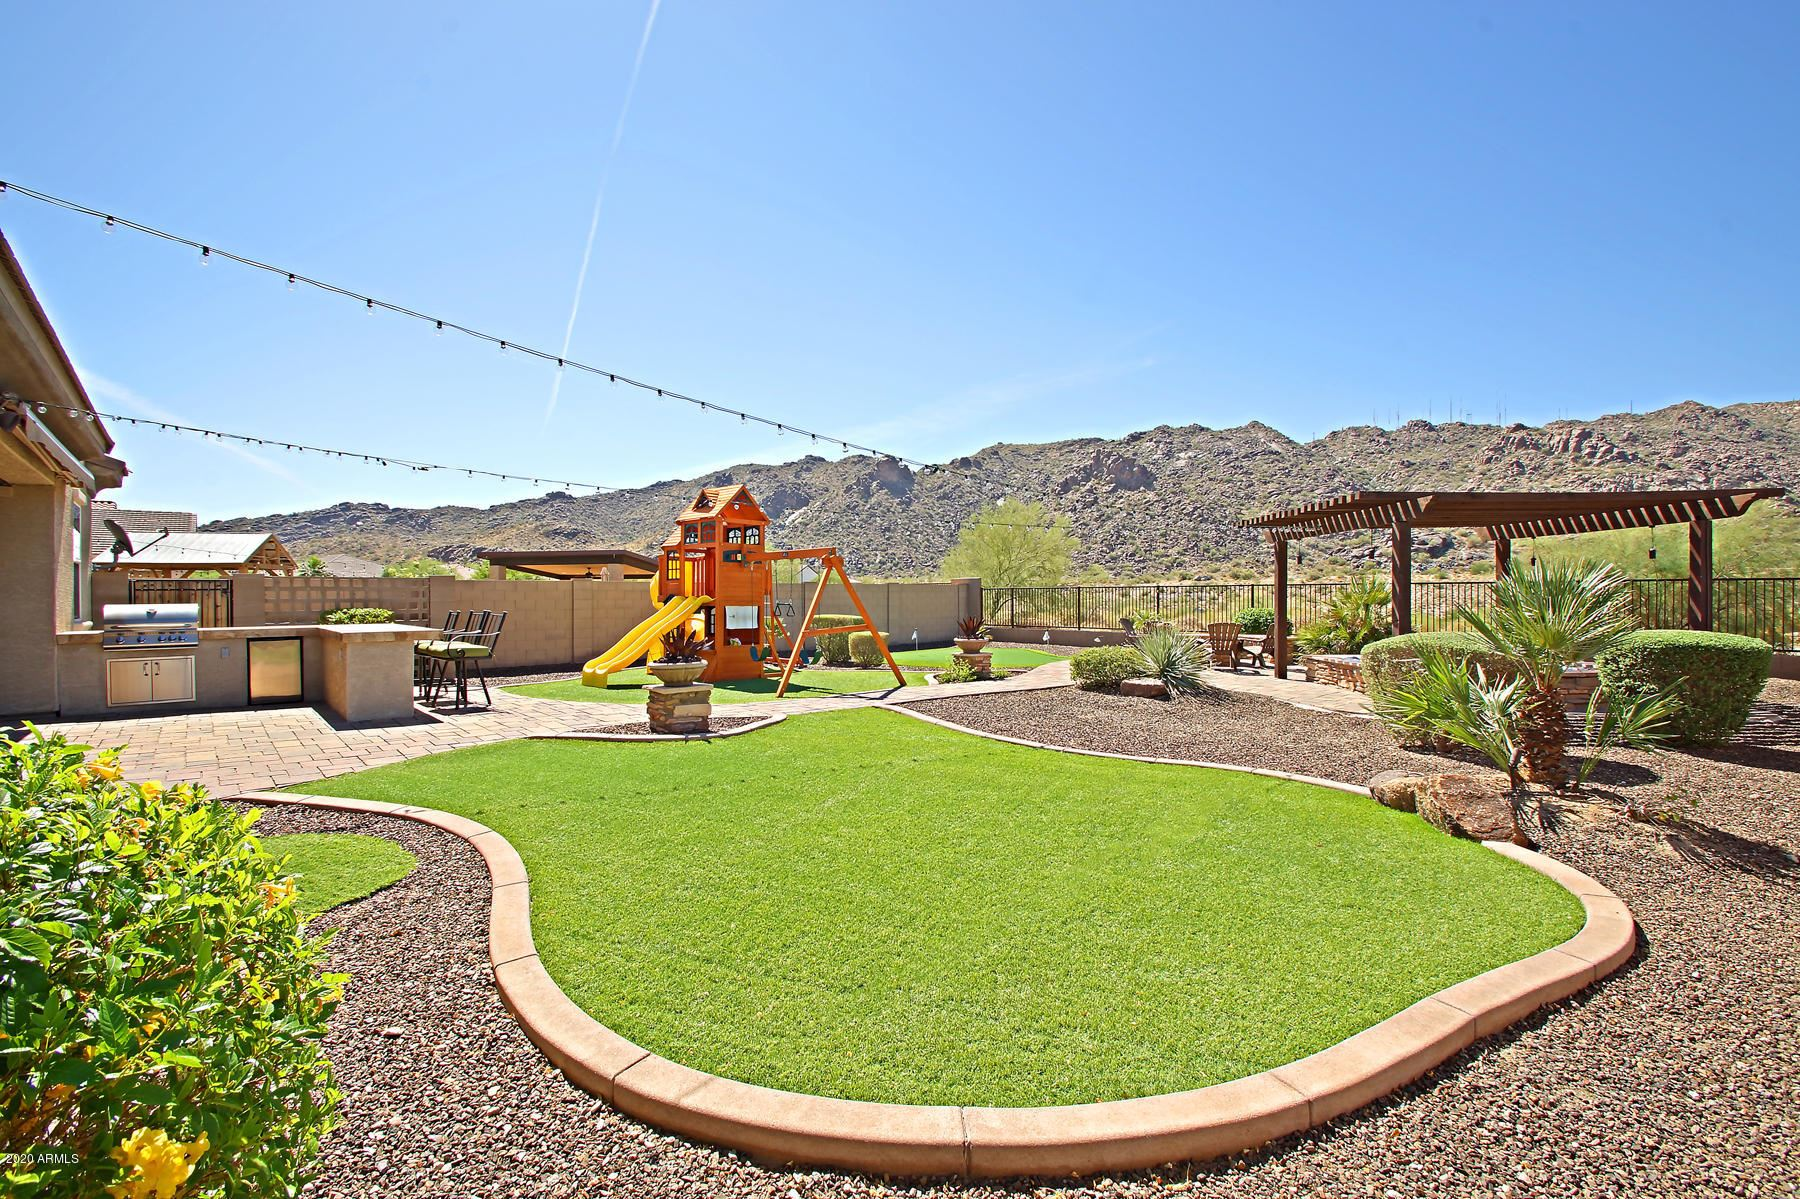 303 E SUMMERSIDE Road, Phoenix, AZ 85042 - MLS#: 6081874